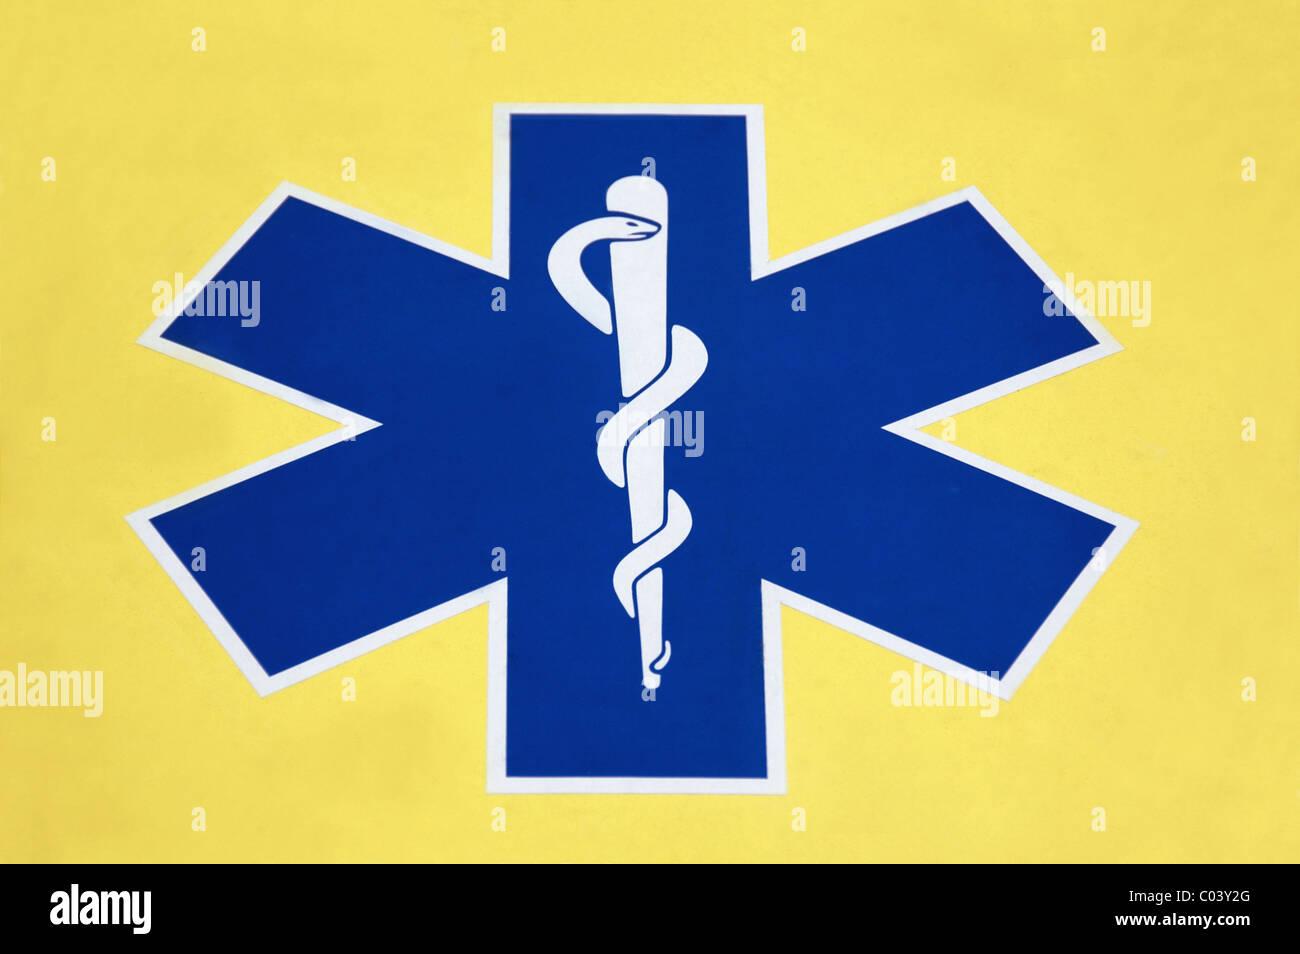 Caduceus Snake And Staff Symbol On Front Of Ambulance London Uk